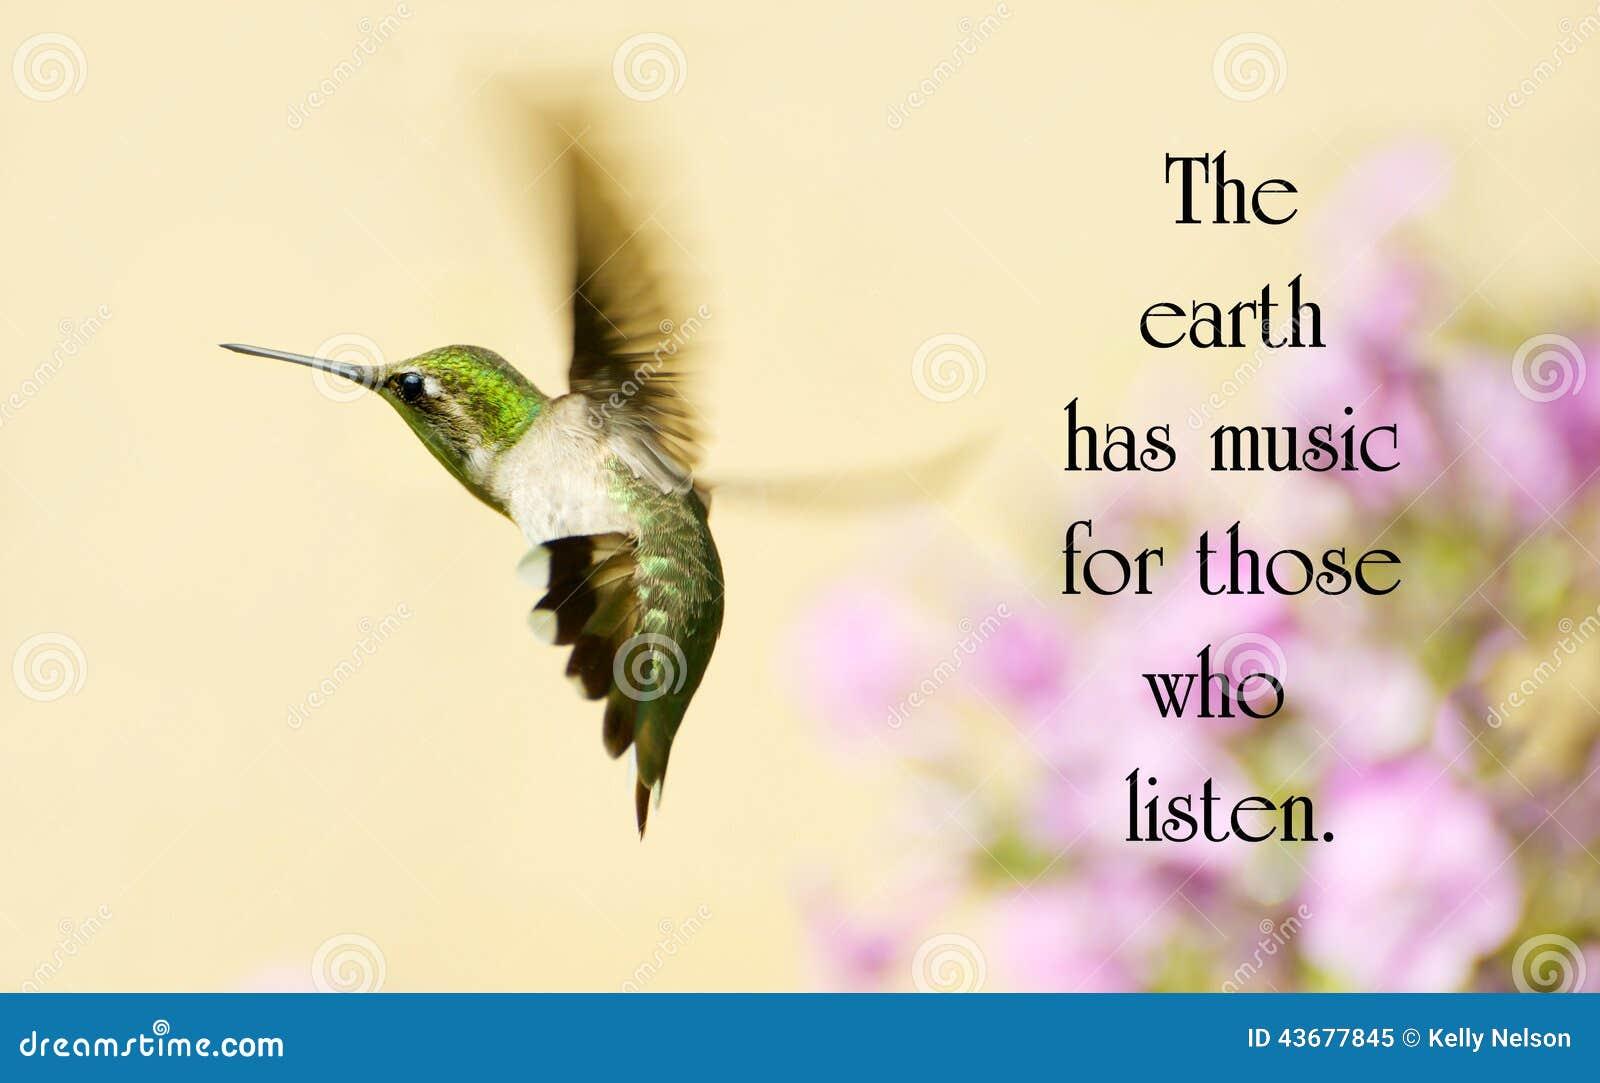 inspirational quote stock photo image 43677845